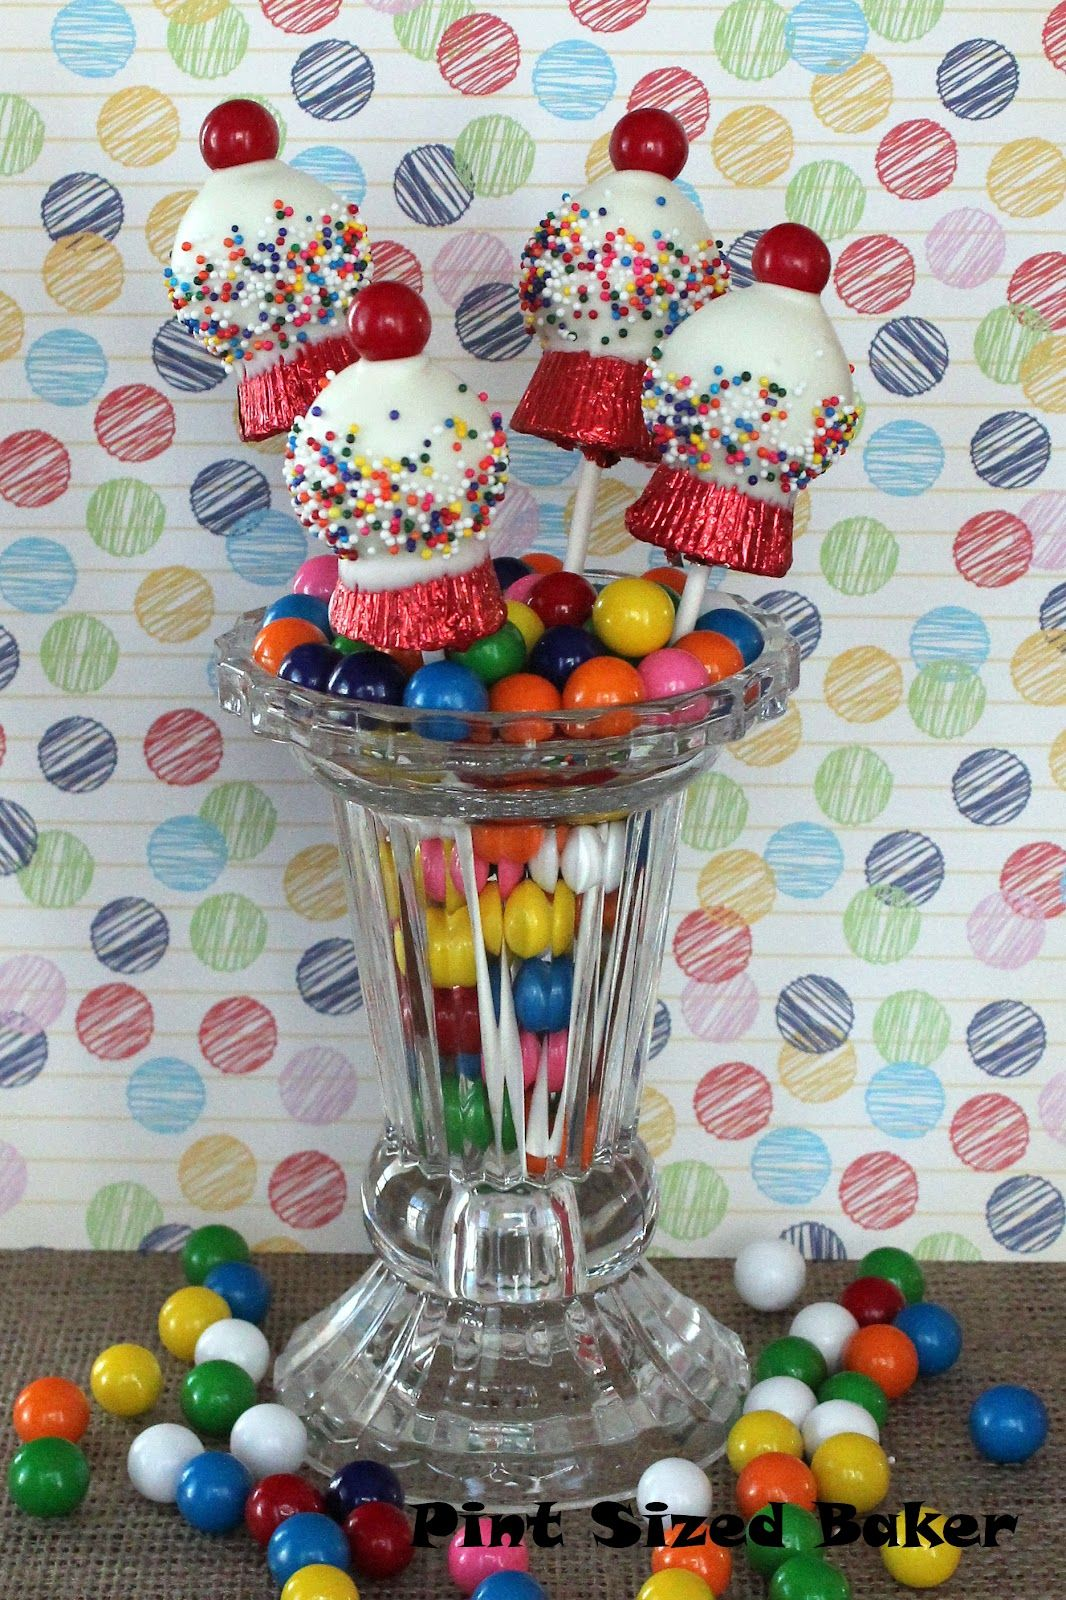 How to Make Gumball Machine Cake Pops